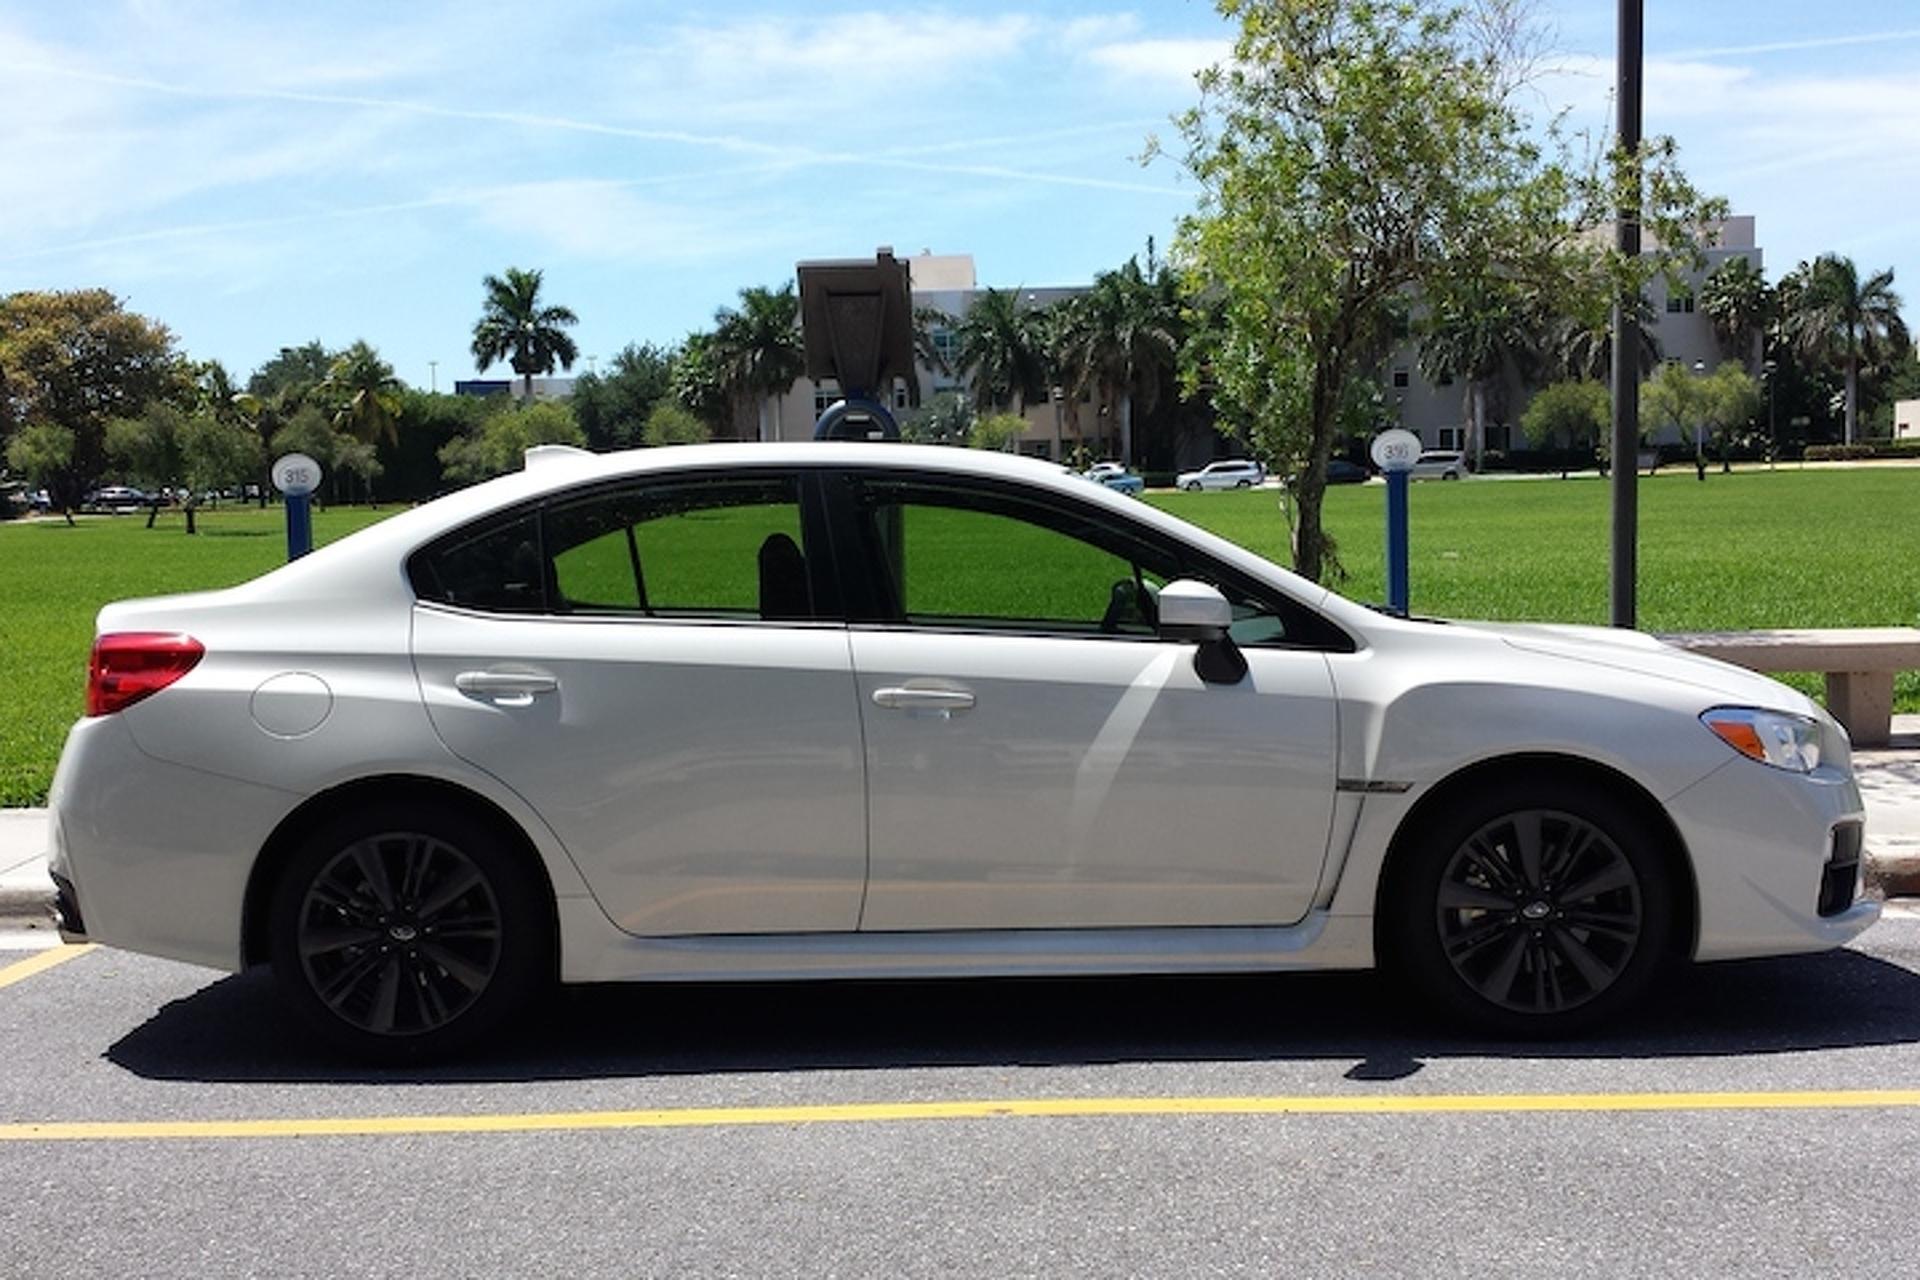 2015 Subaru WRX Quick Drive: A Grippy First Impression